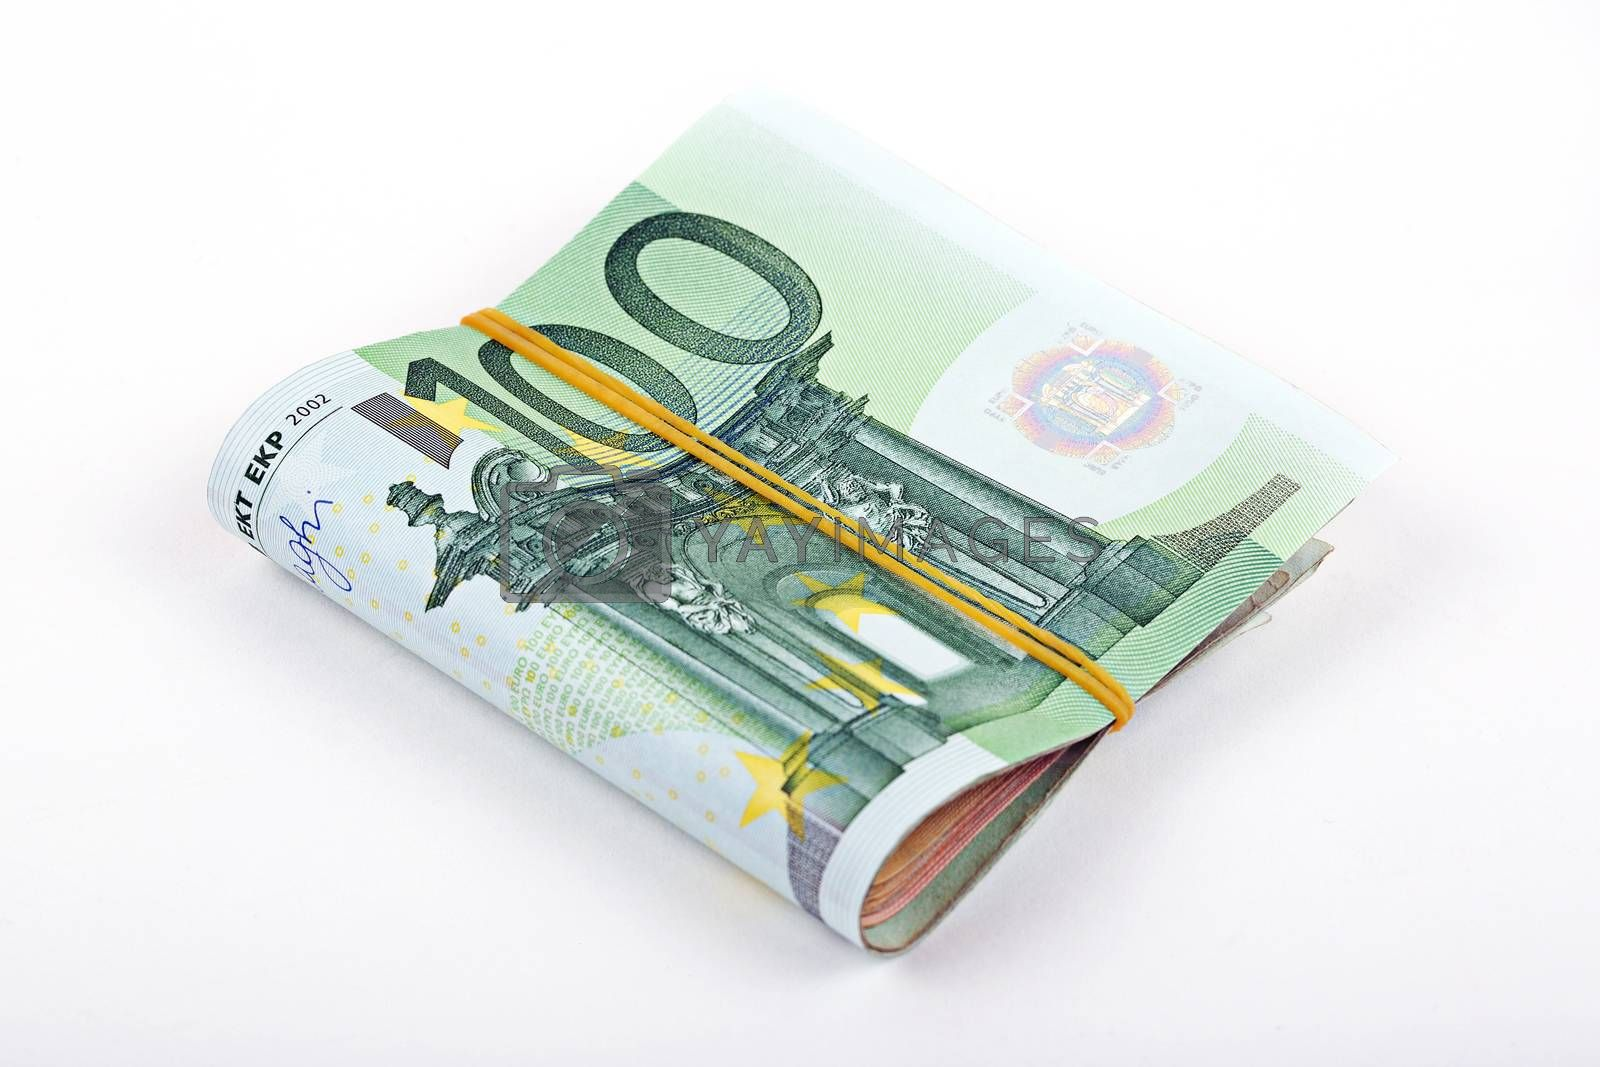 Bundle of European currency - 100 euro